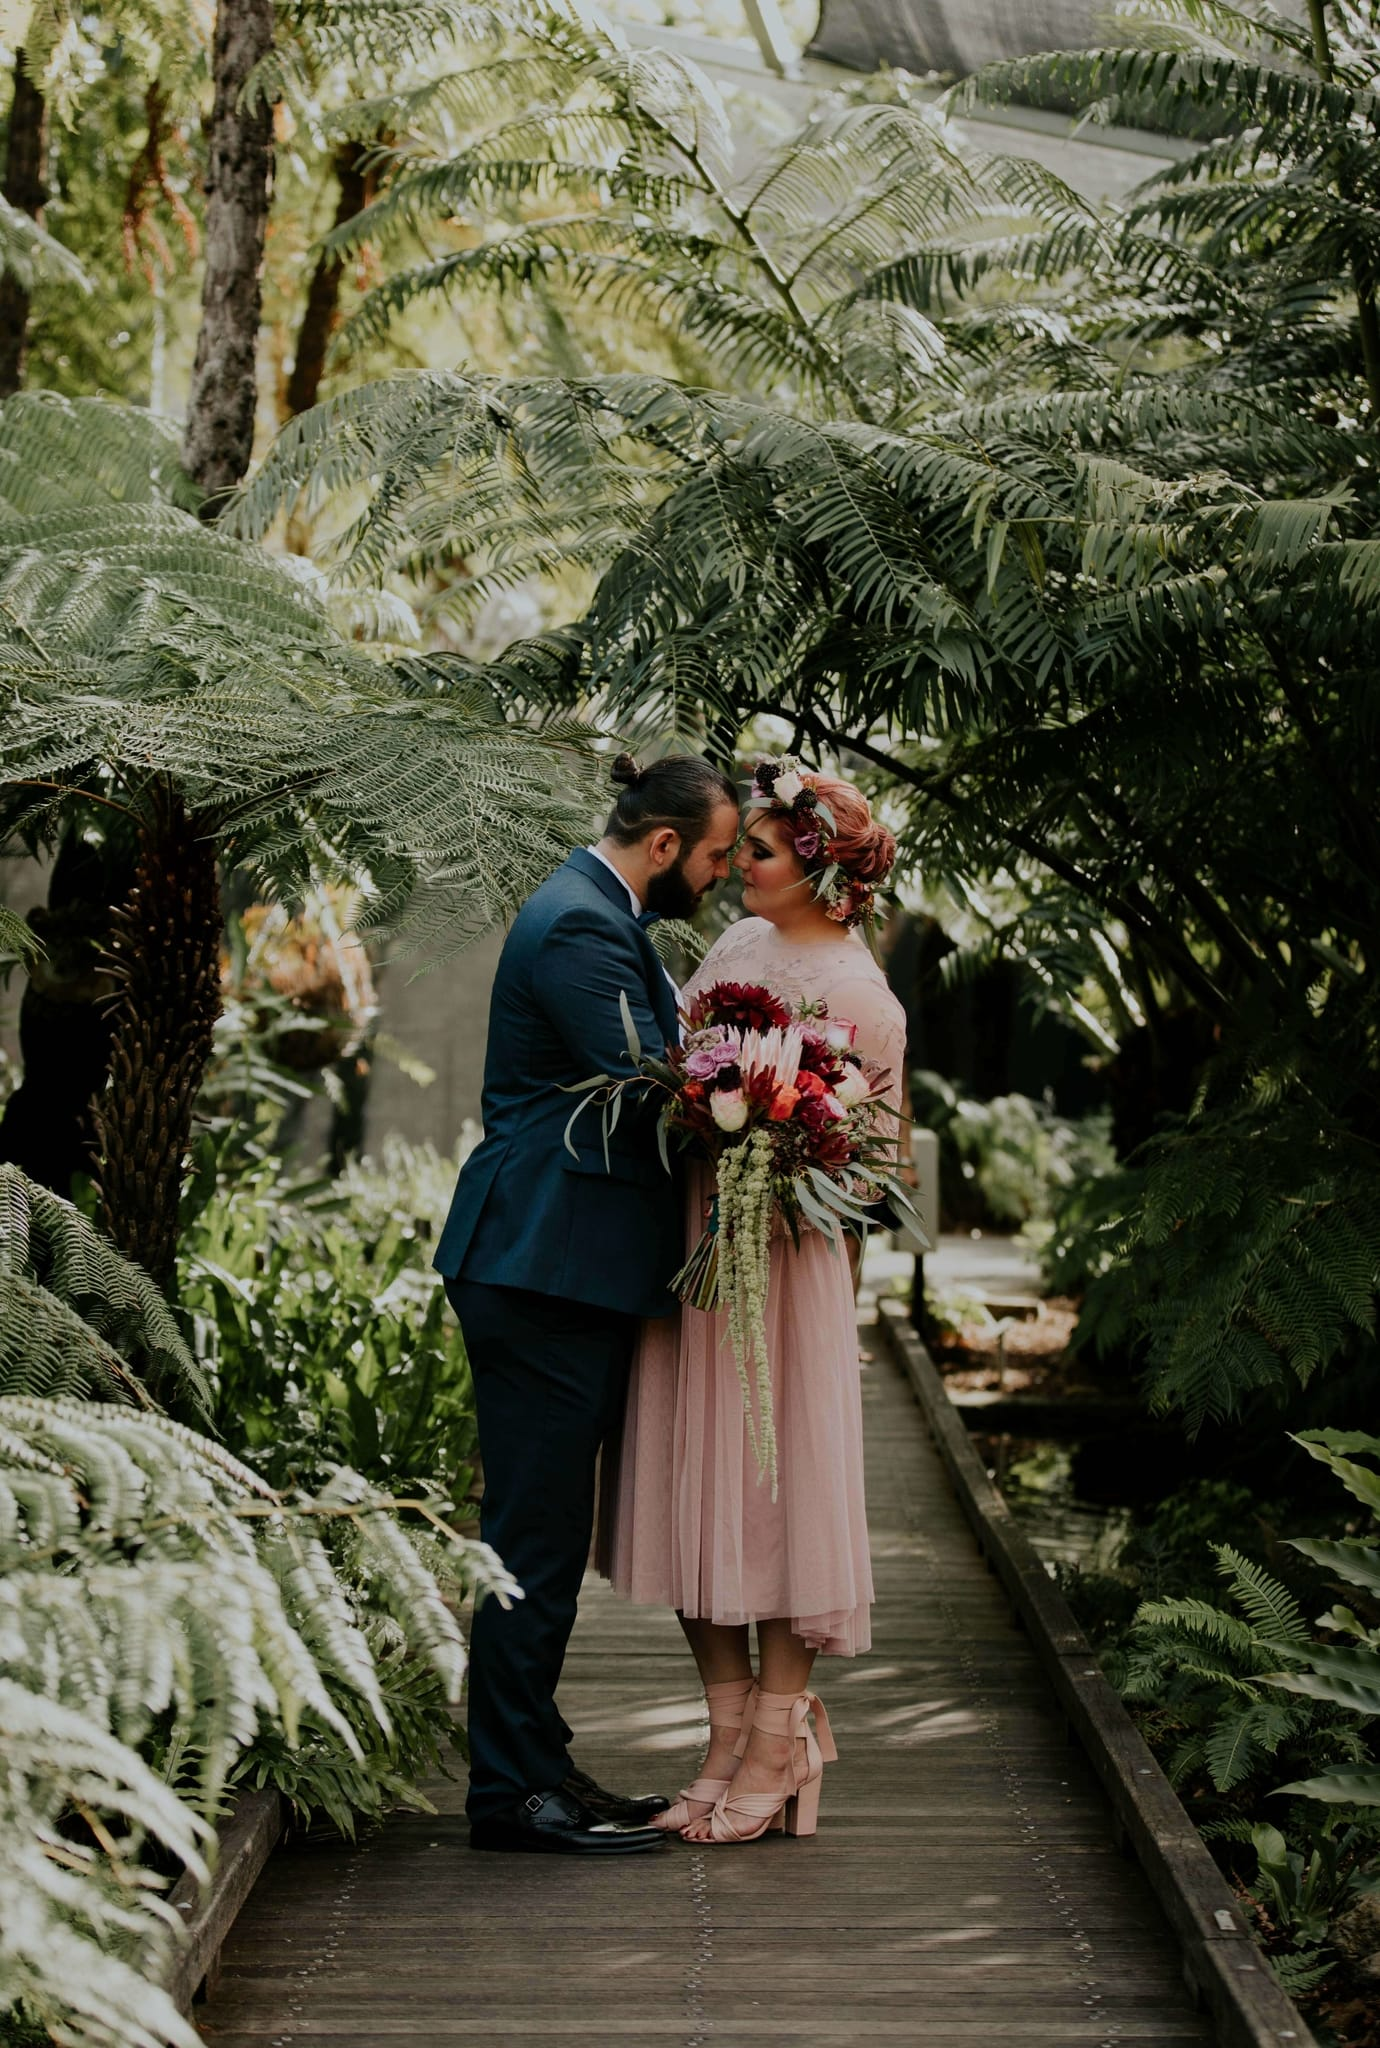 Brisbane-Wedding-Photographer-Natalie-Skoric-14.jpg